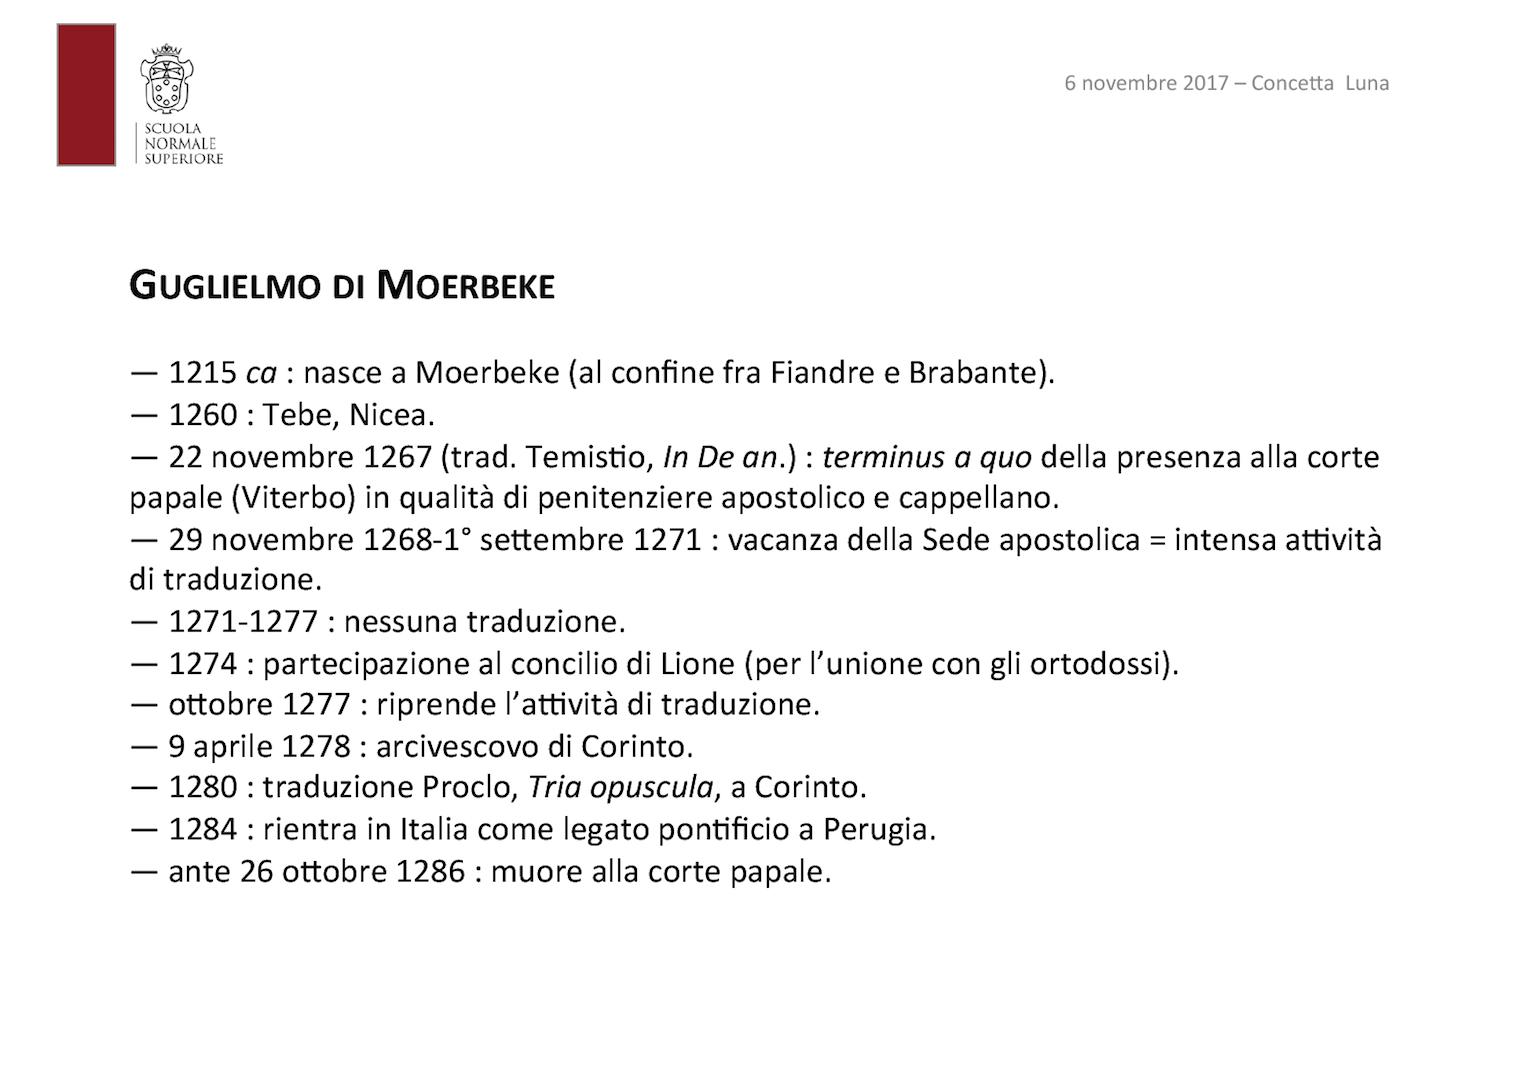 A lecture by Concetta Luna p.2